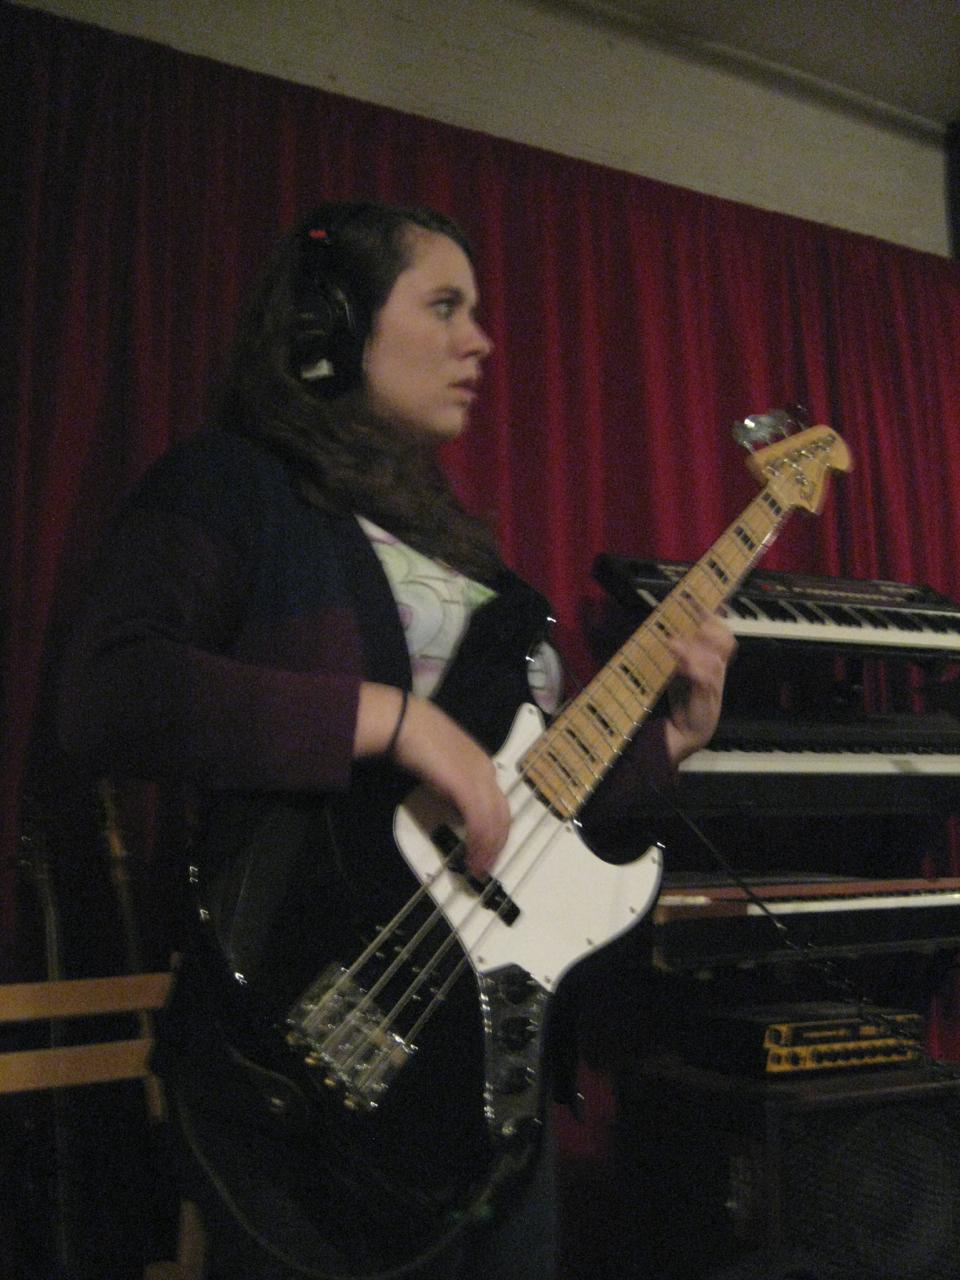 Jessica Kion on bass.